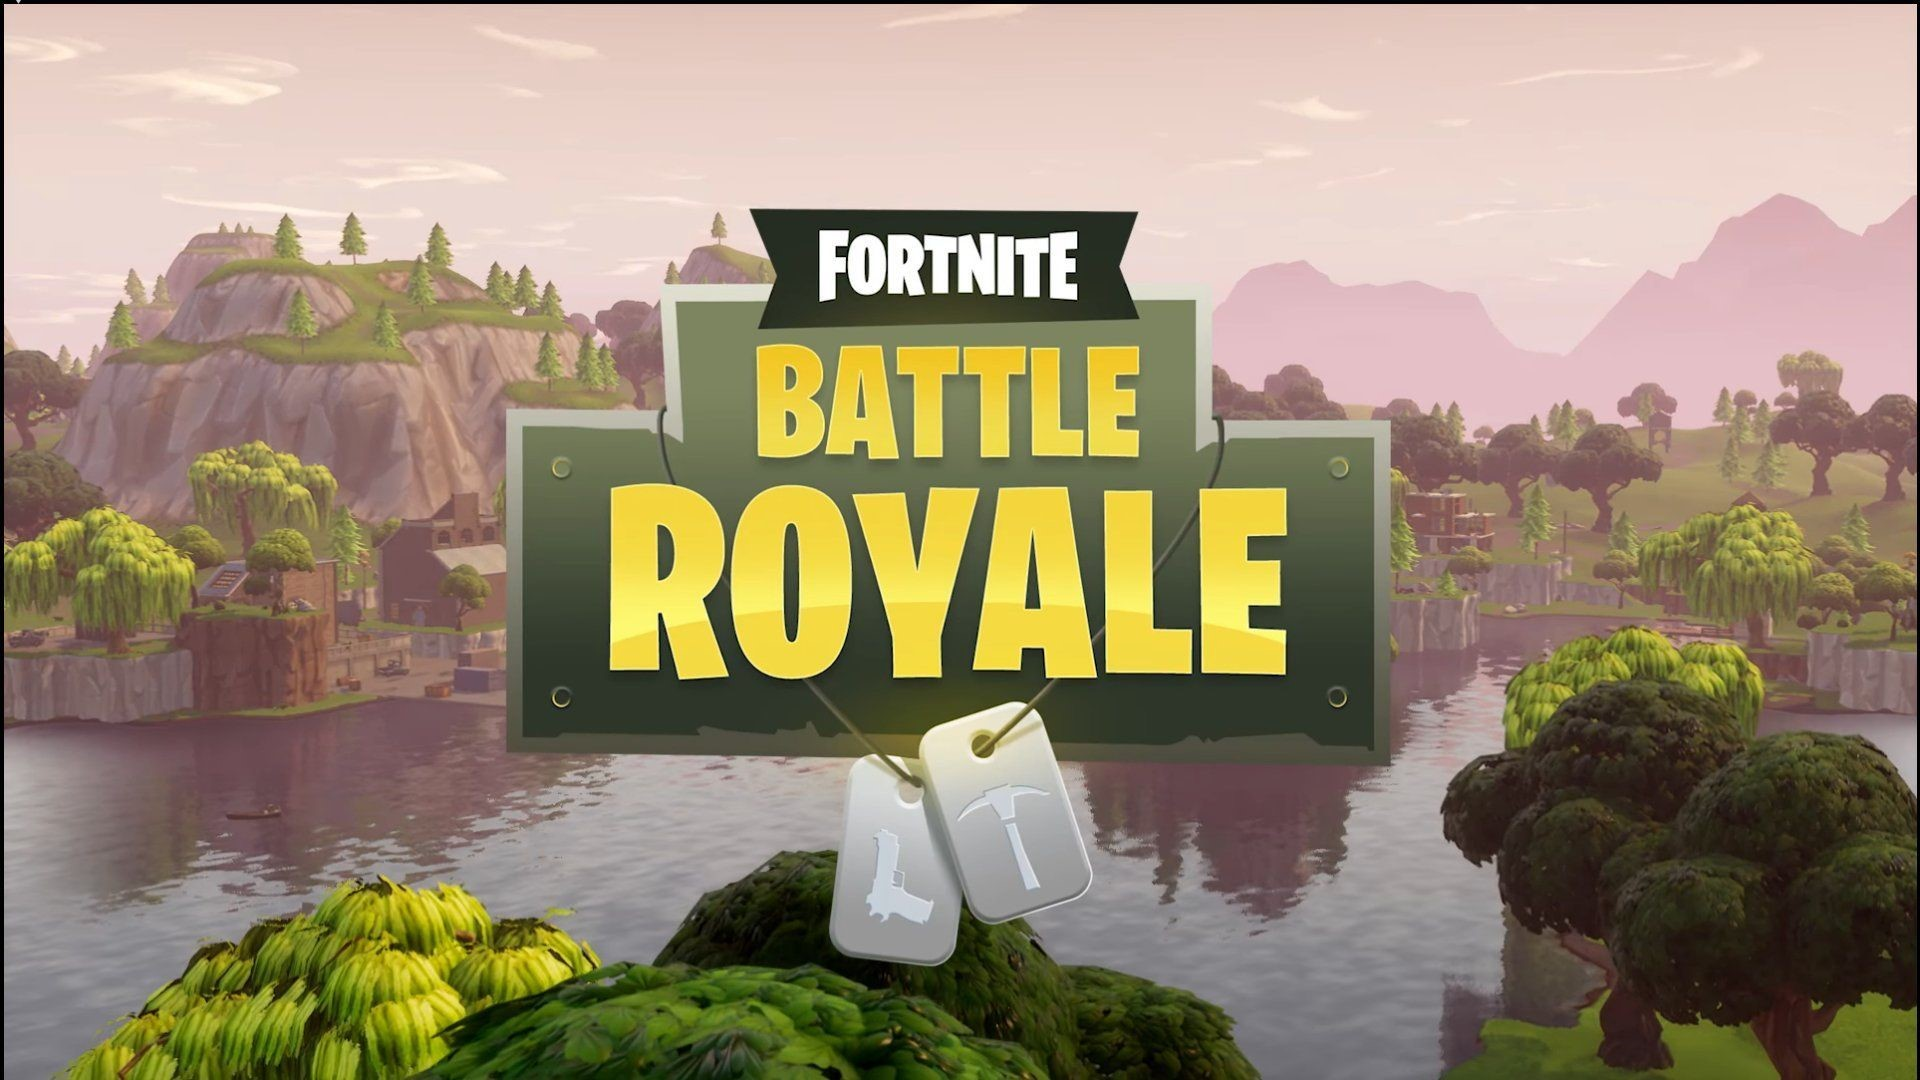 Fortnite Battle Royale HD Background